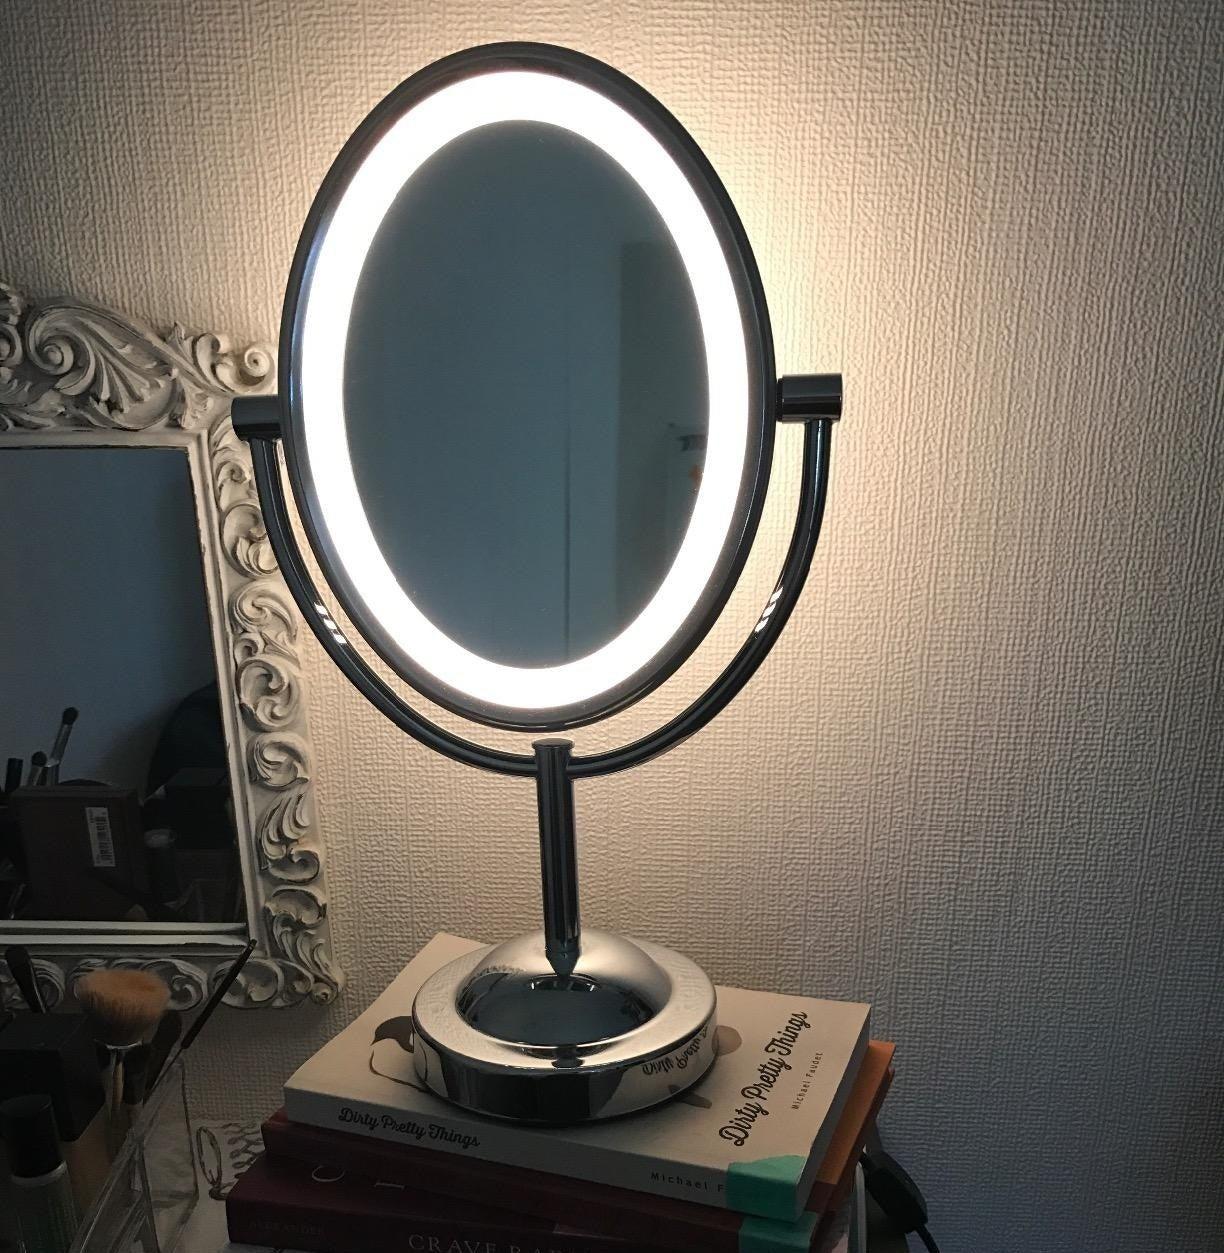 The lit mirror